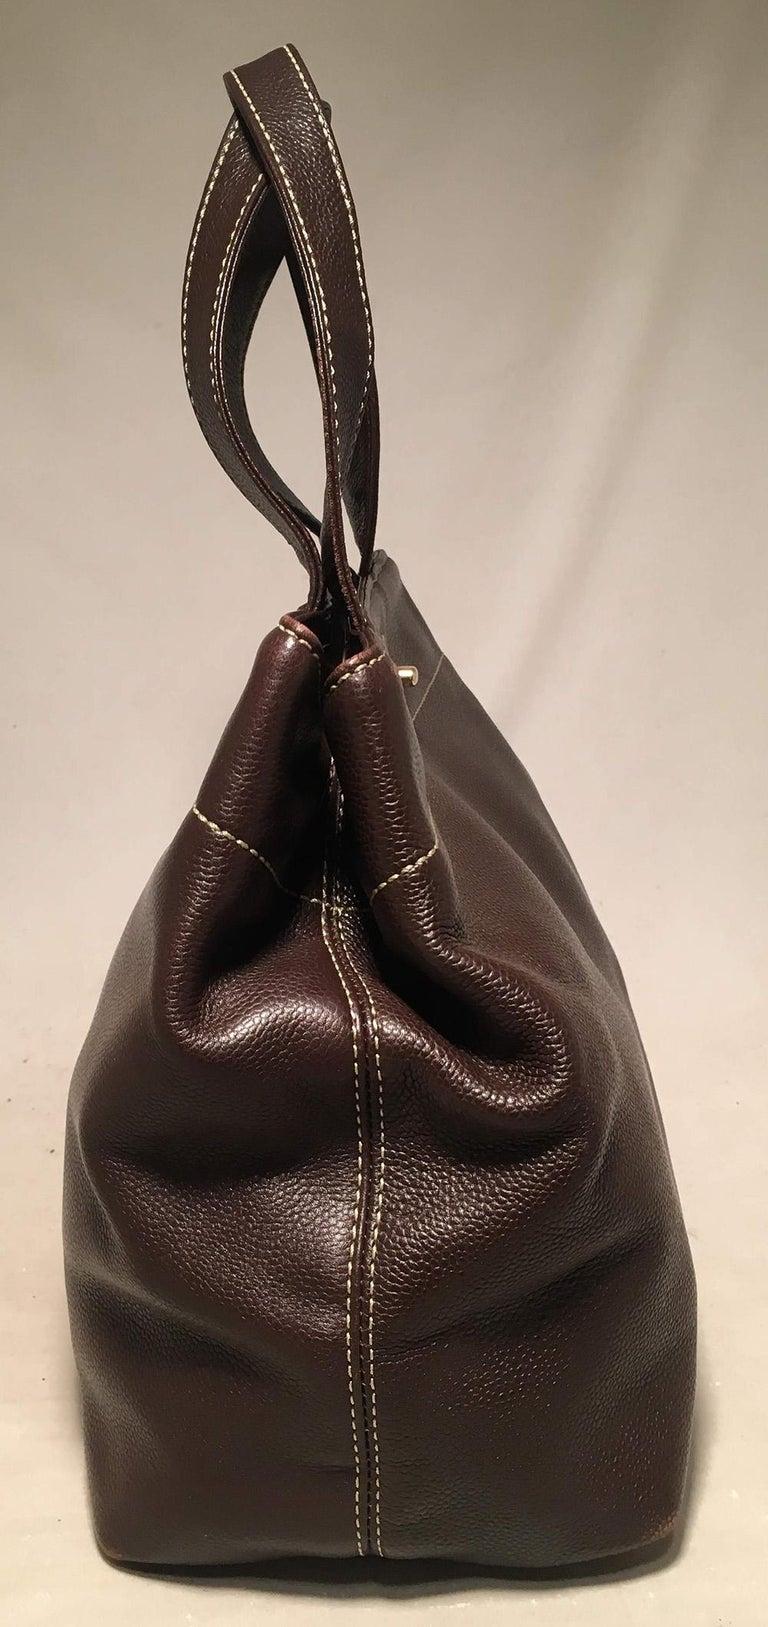 Chanel Dark Brown Caviar Top Handle Shoulder Bag Tote In Good Condition For Sale In Philadelphia, PA